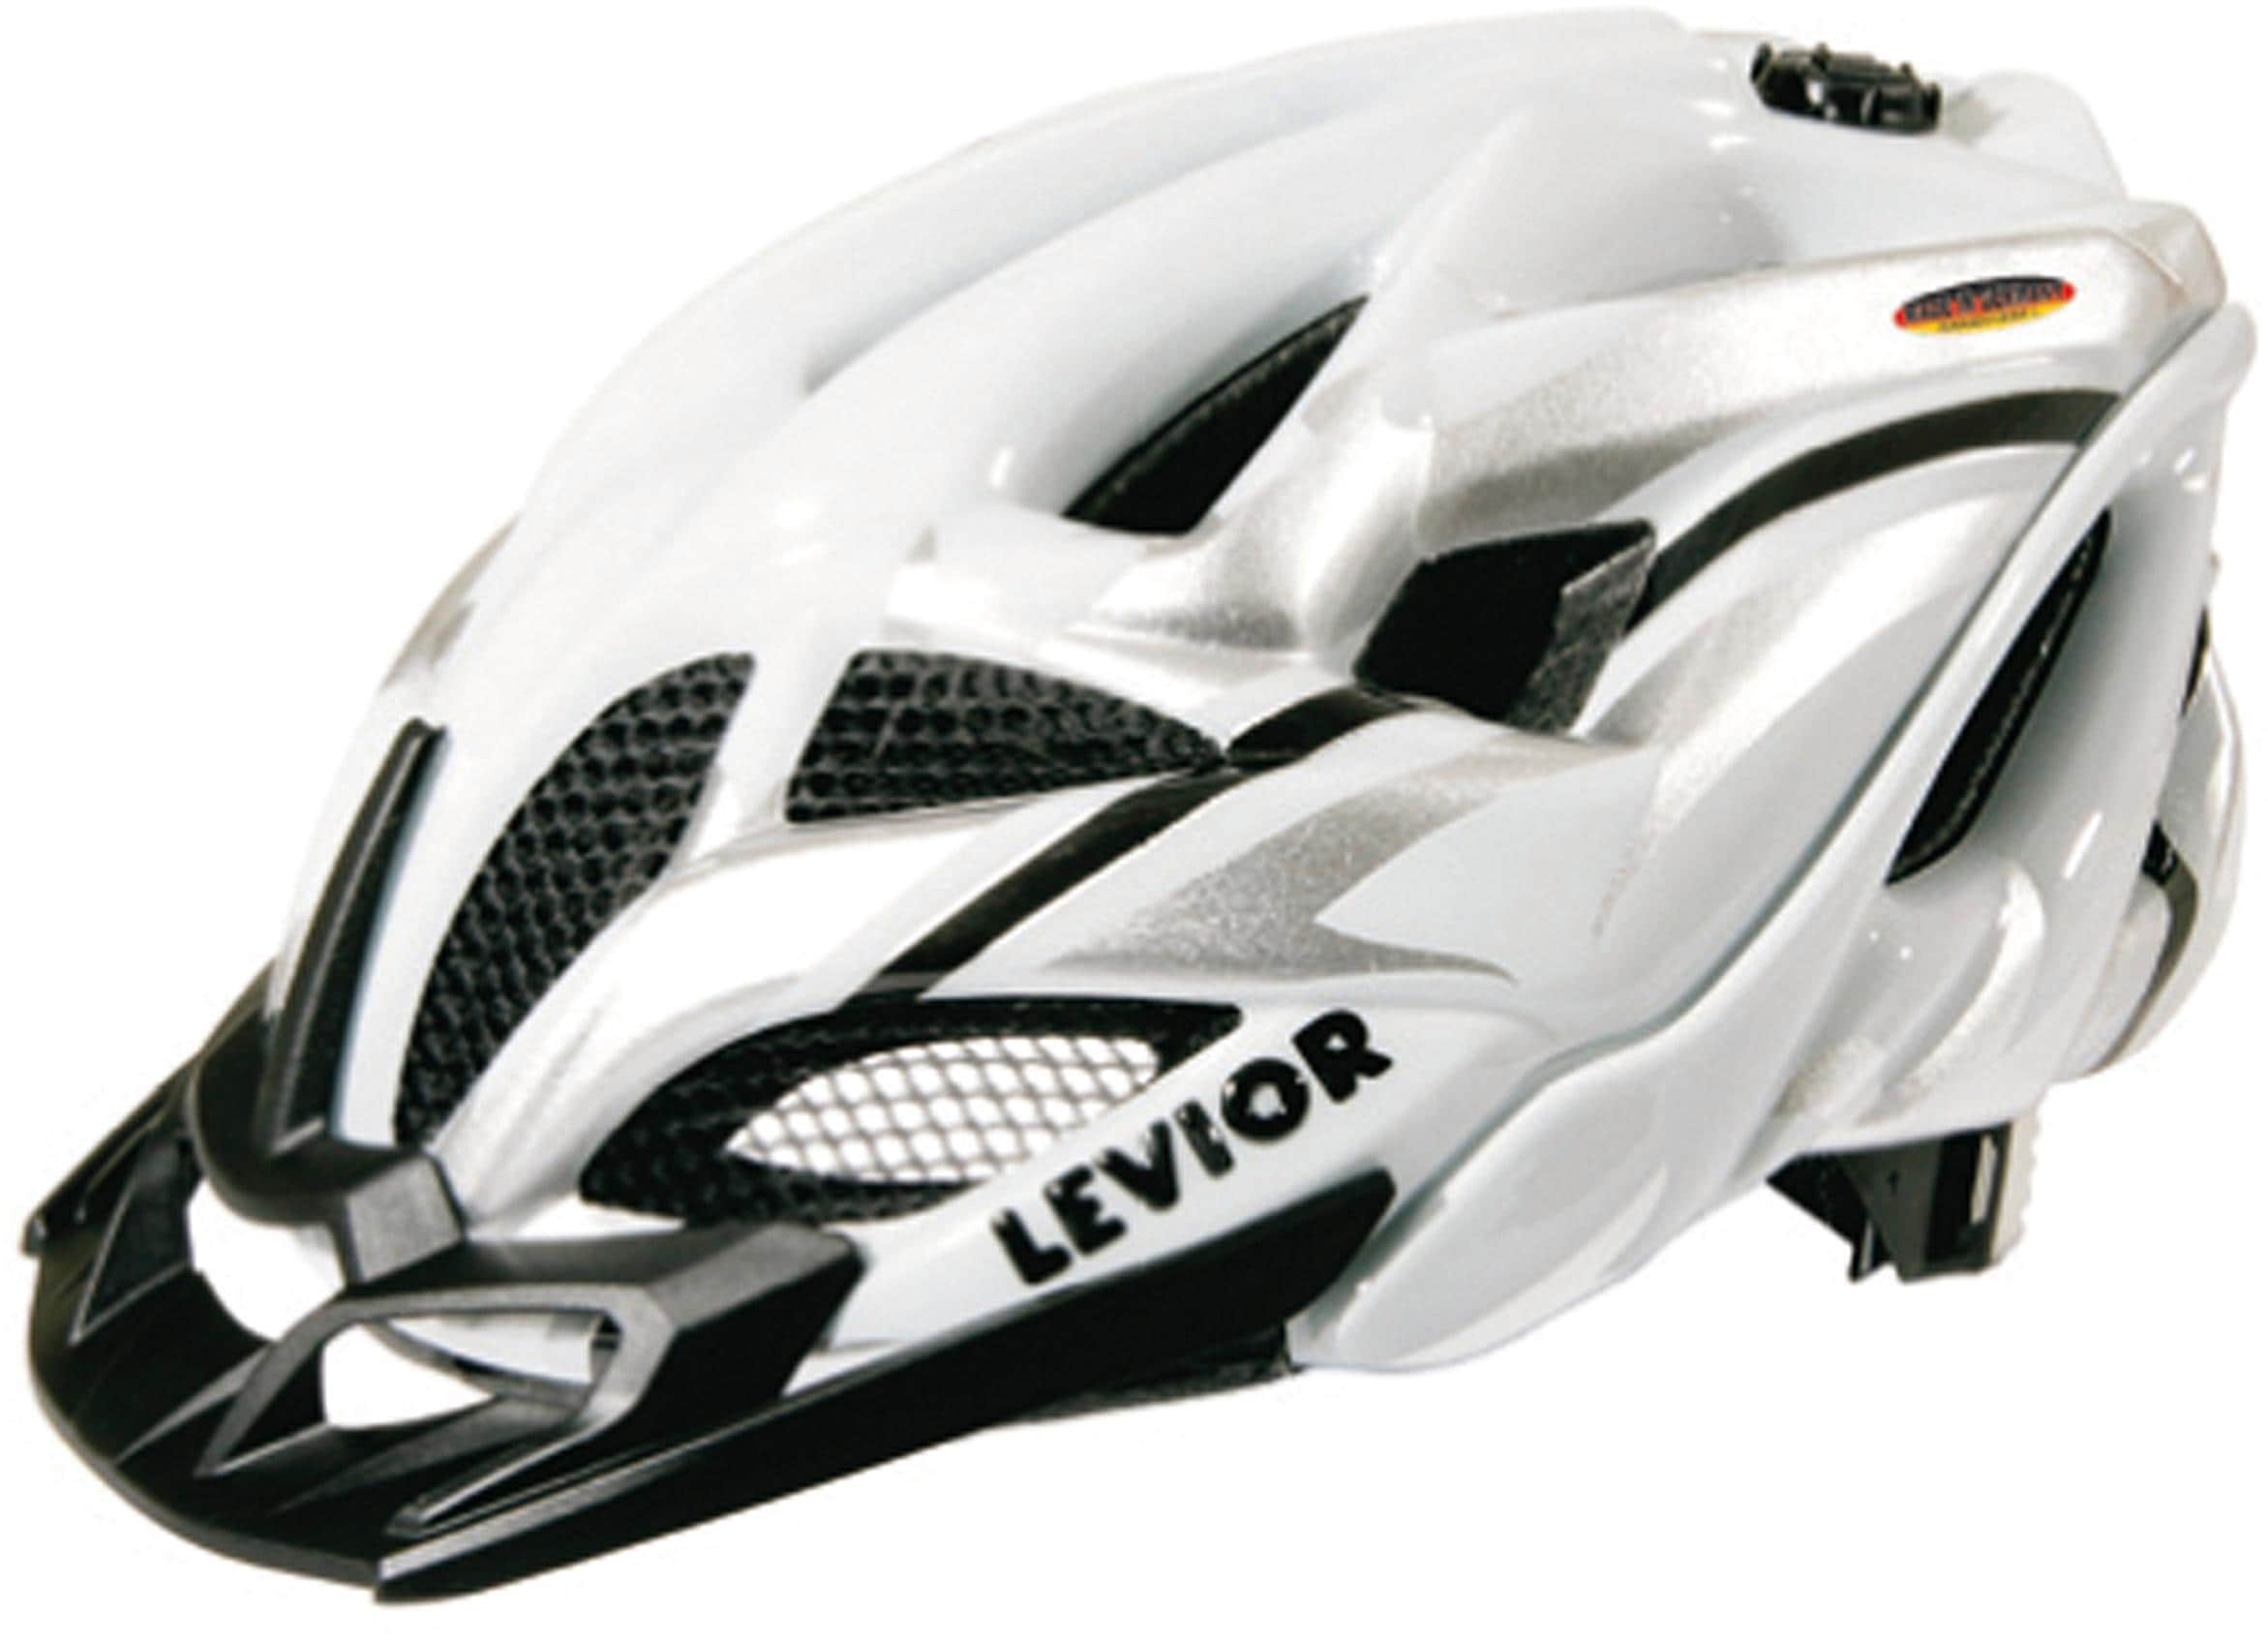 Levior Fahrradhelm »Opus Visor« | Accessoires > Caps > Visors | Weiß | LEVIOR